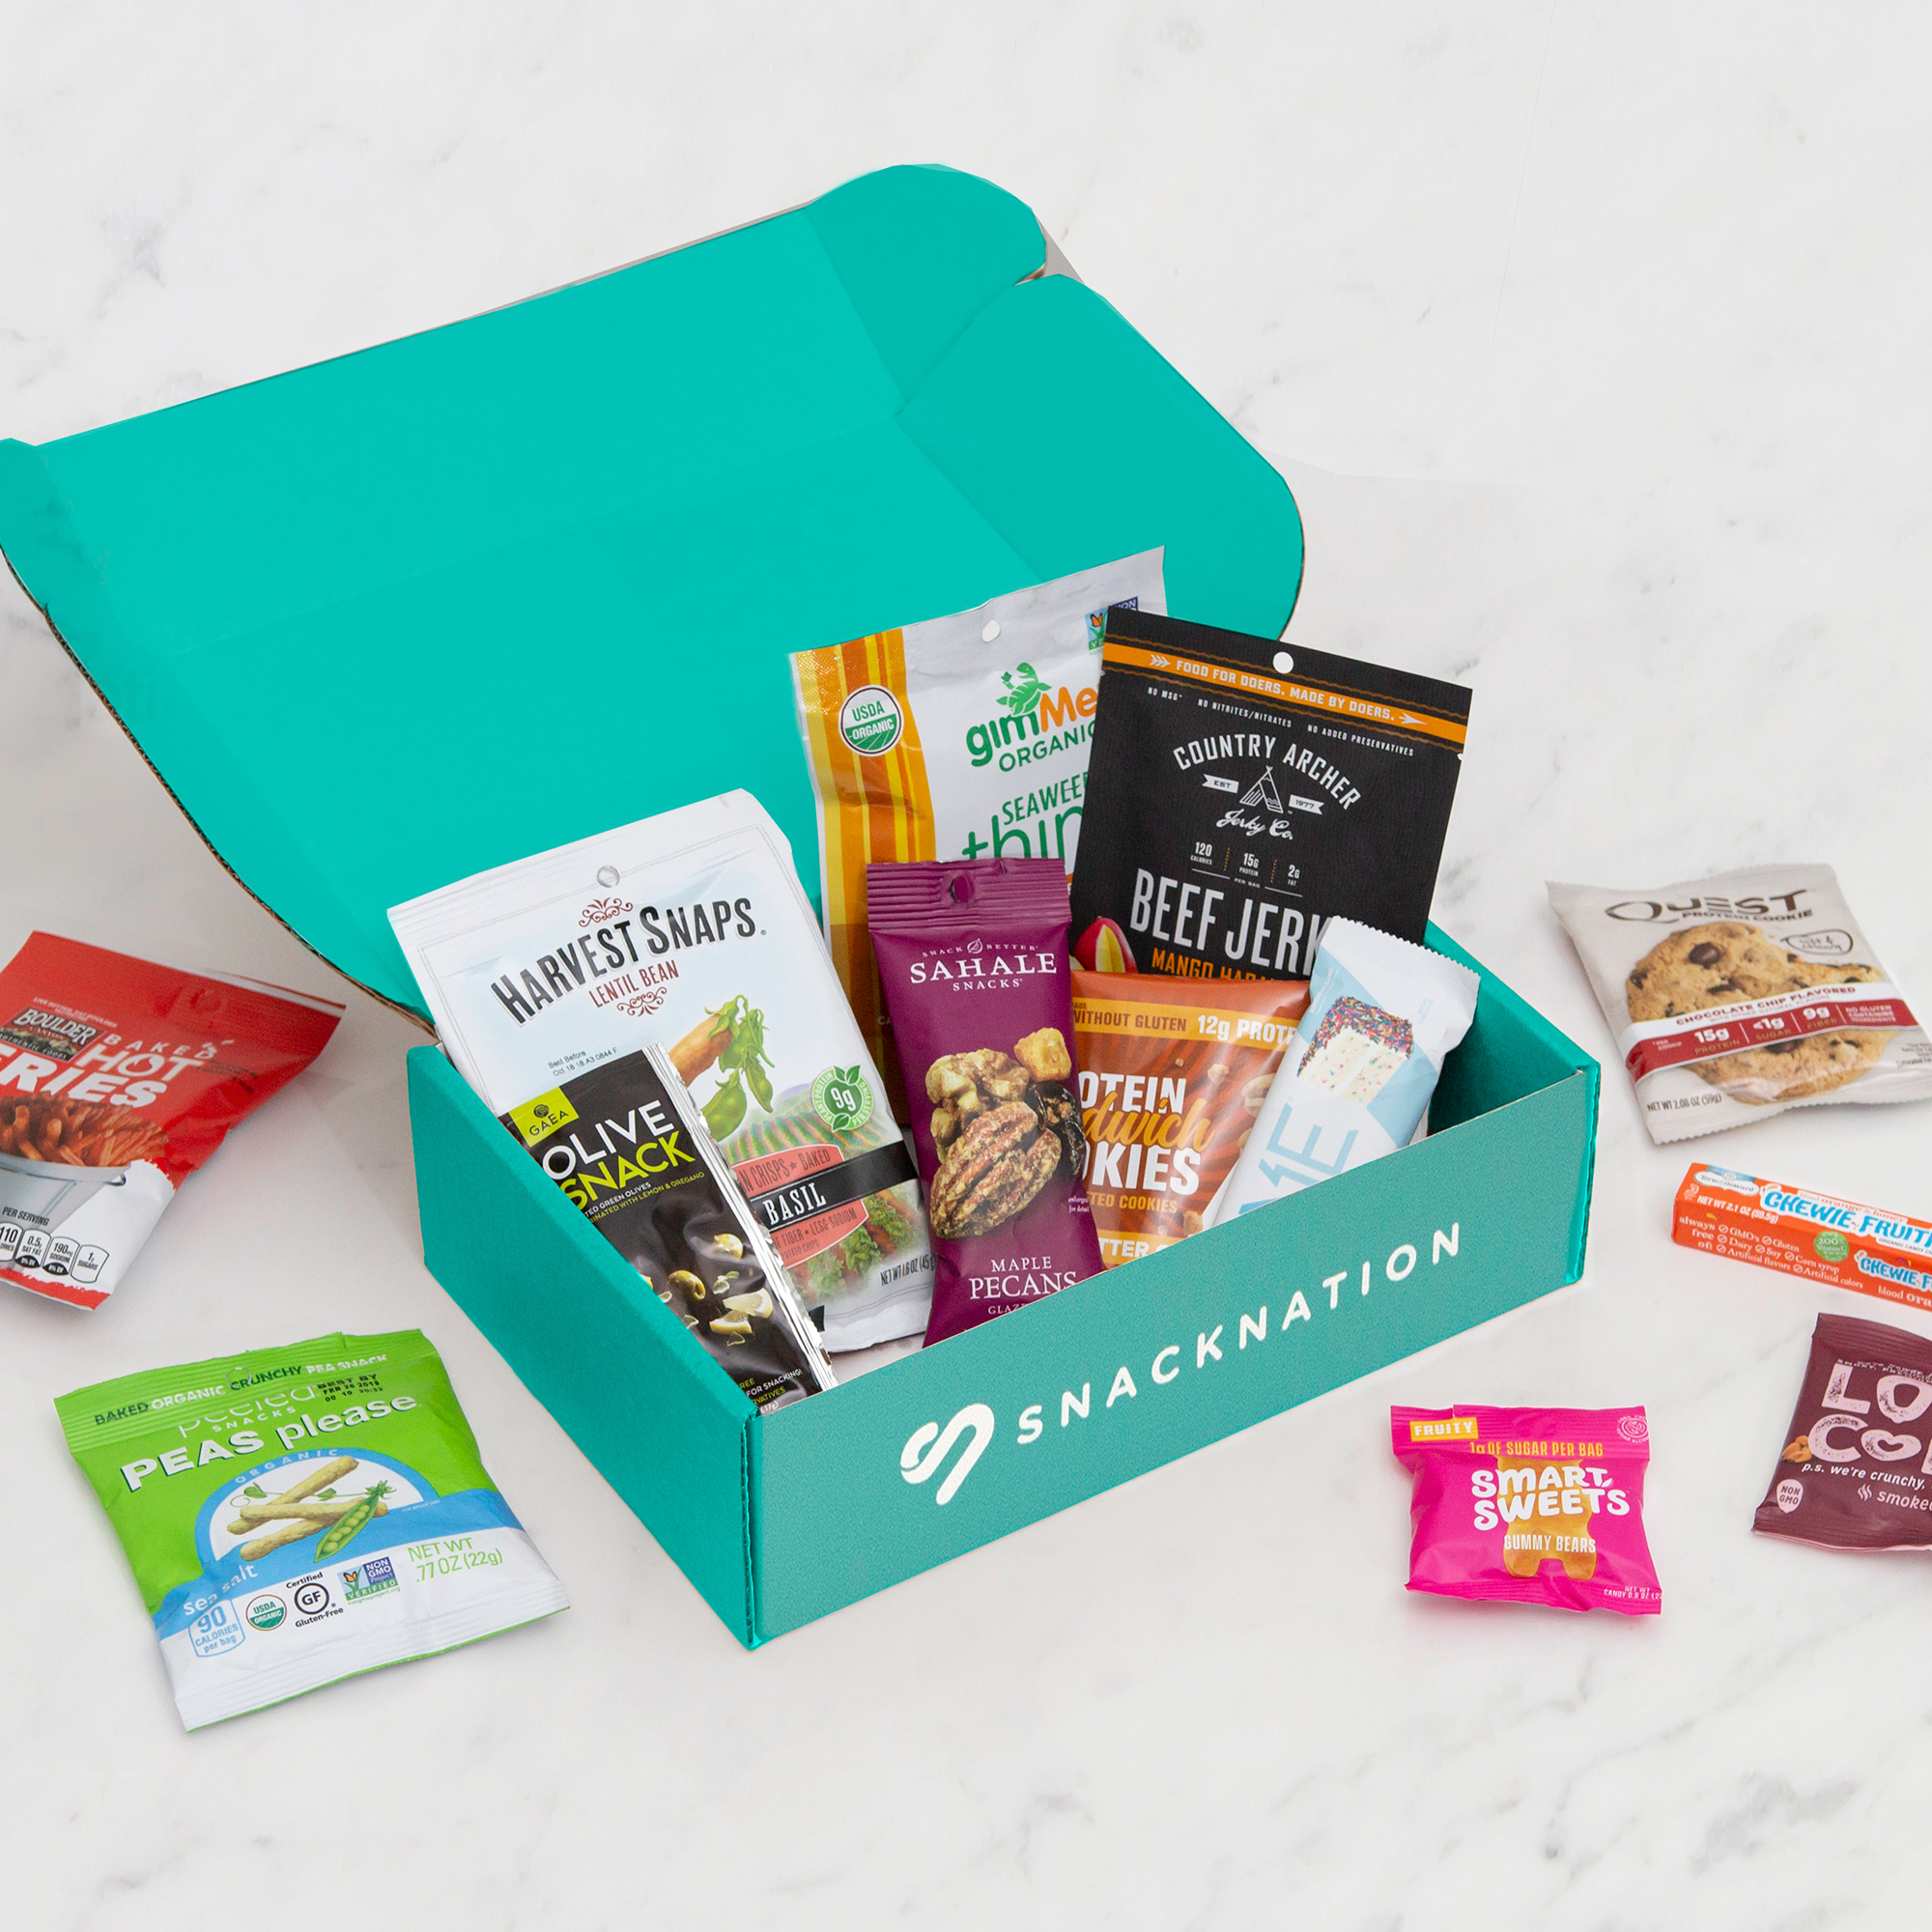 SnackNation - Expert Curated Delicious Healthier Snacks Subscription Box: 15 Snacks